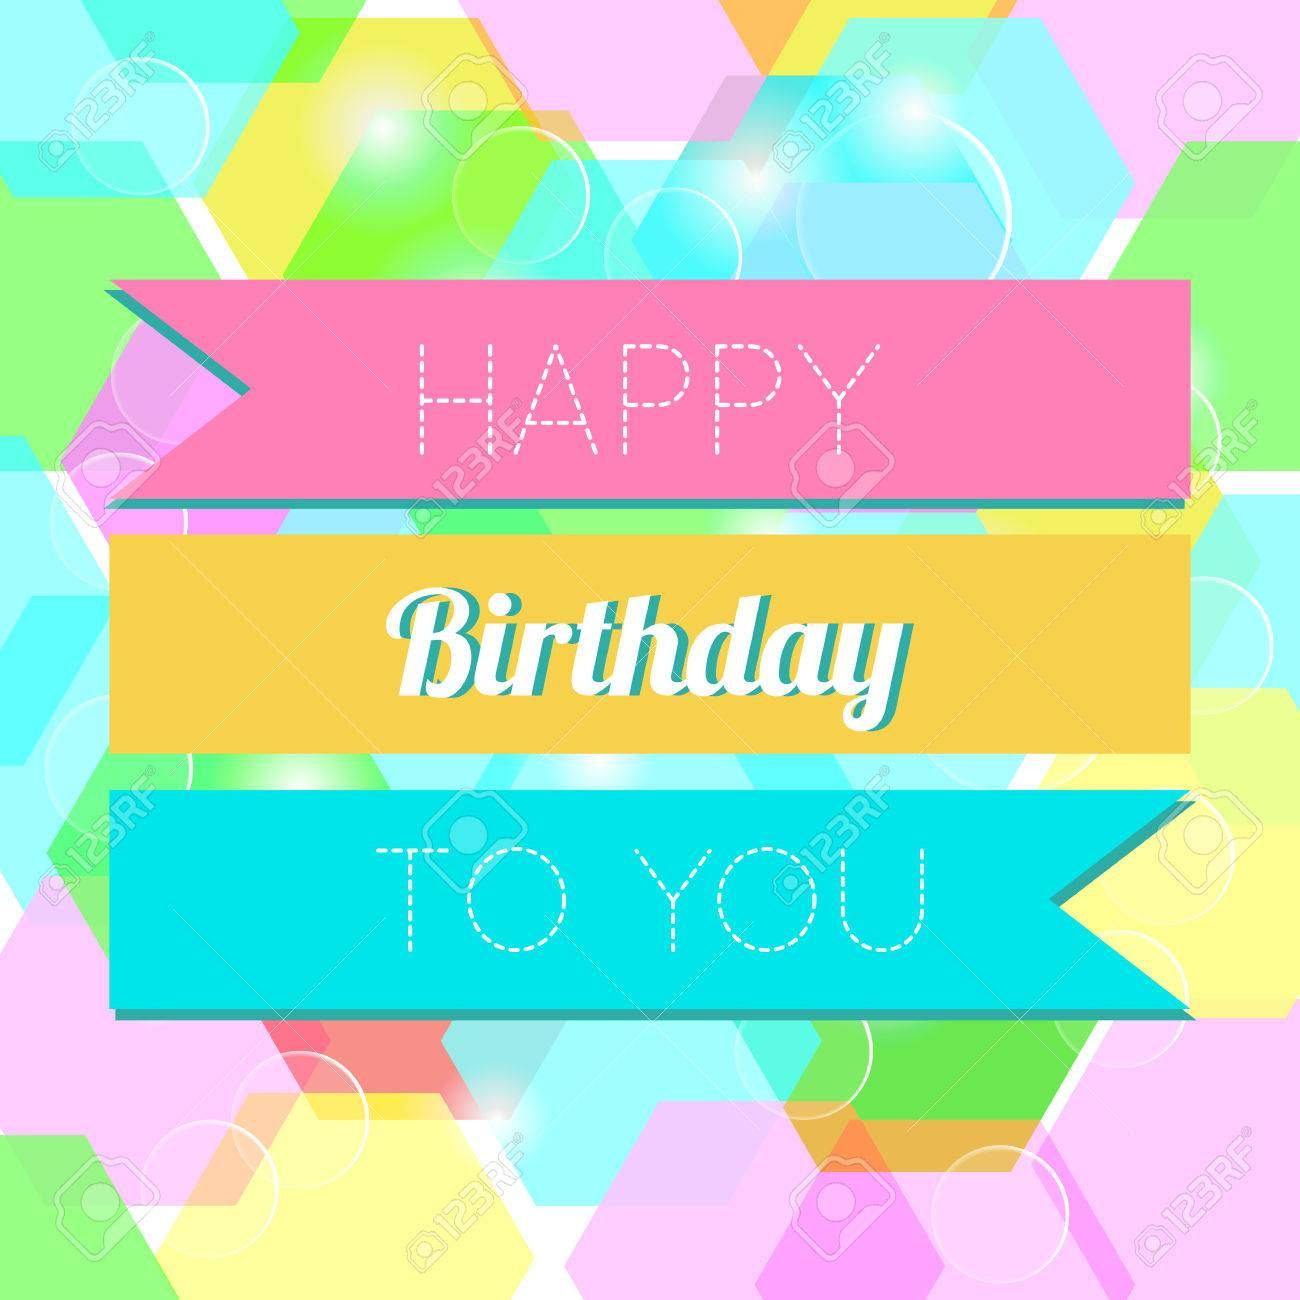 Colorful Happy Birthday Greeting Card Design Illustration Royalty